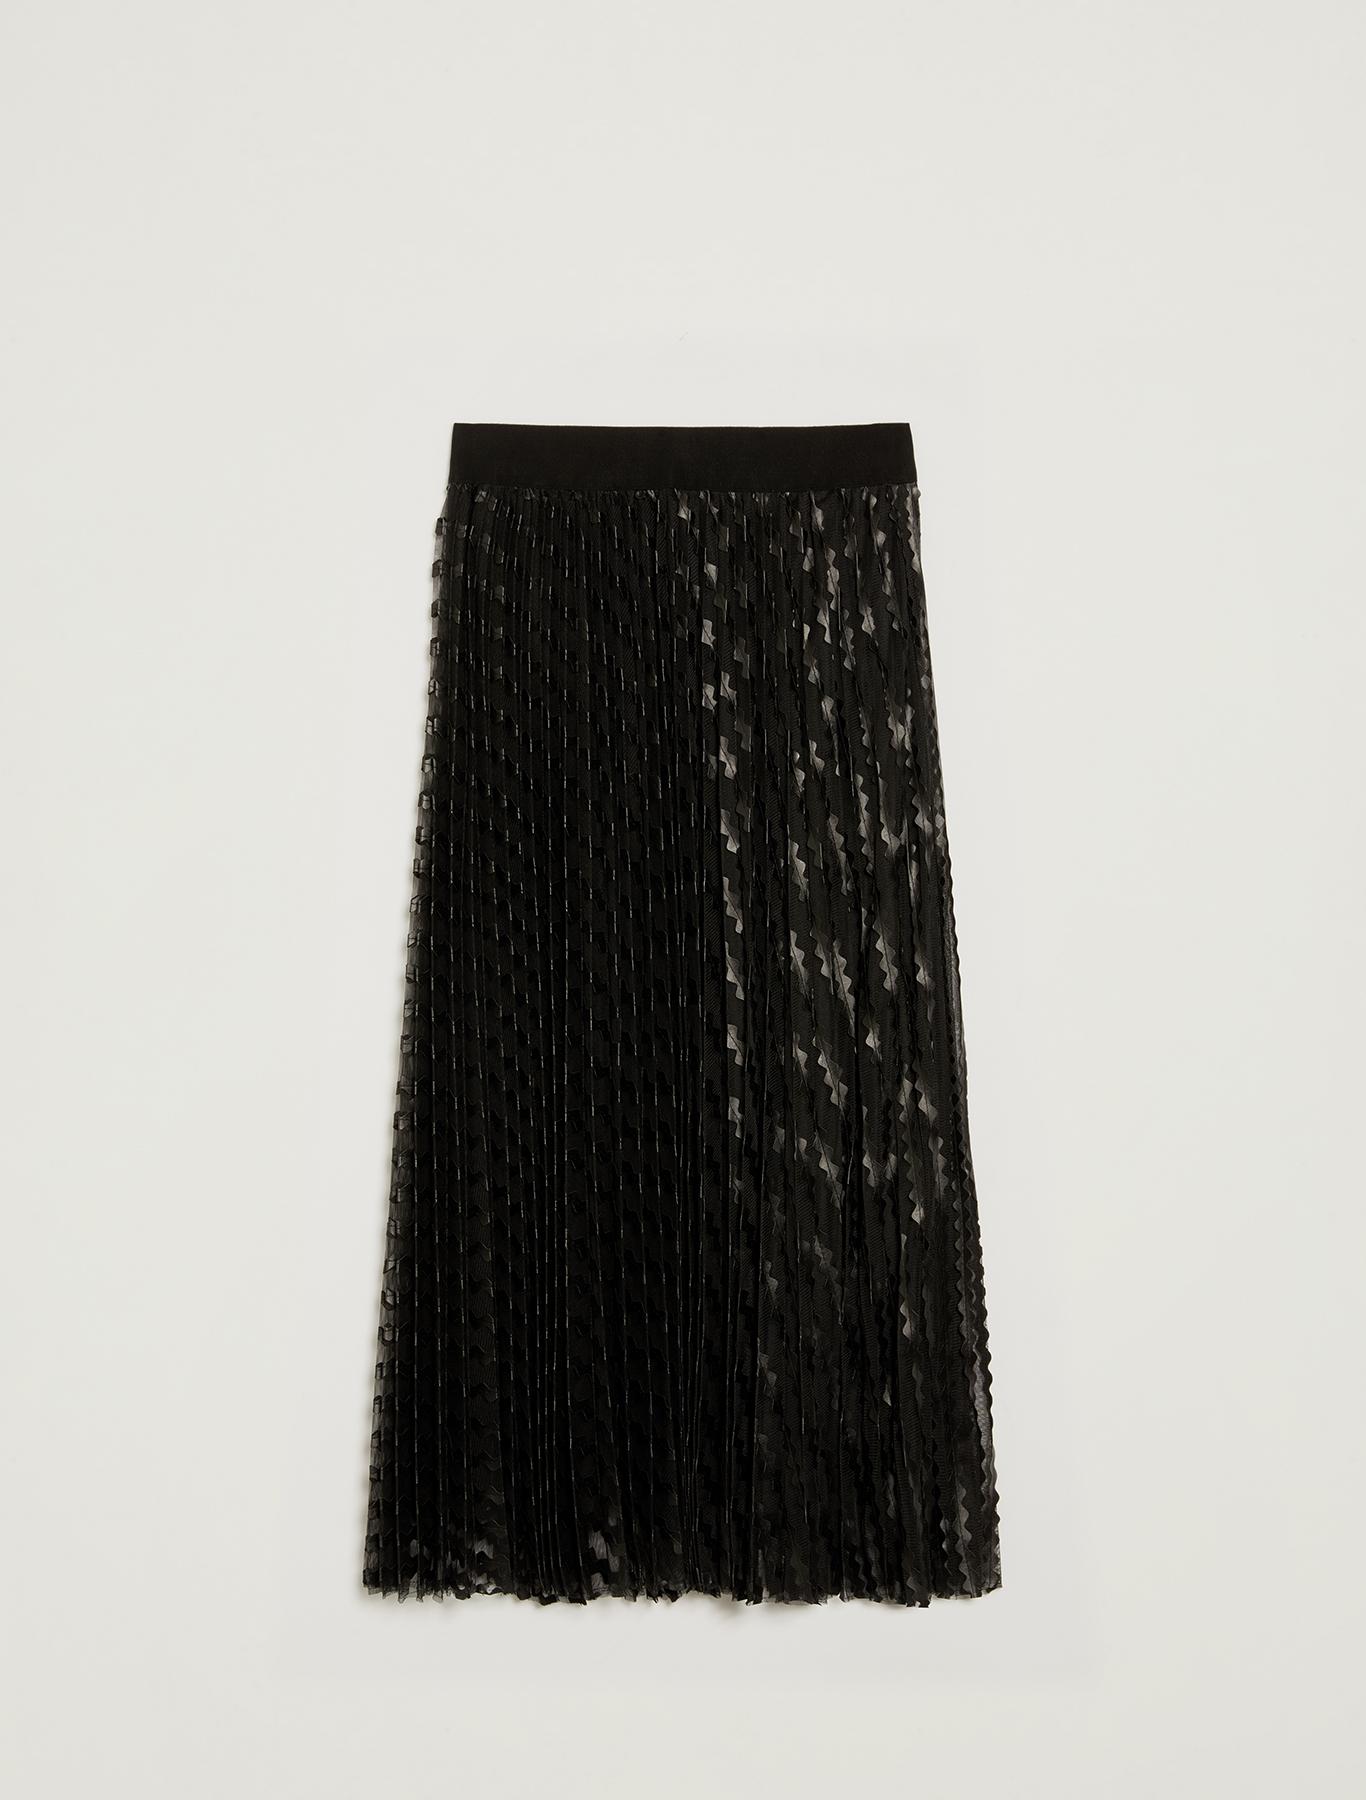 Tulle skirt with appliqués - black - pennyblack